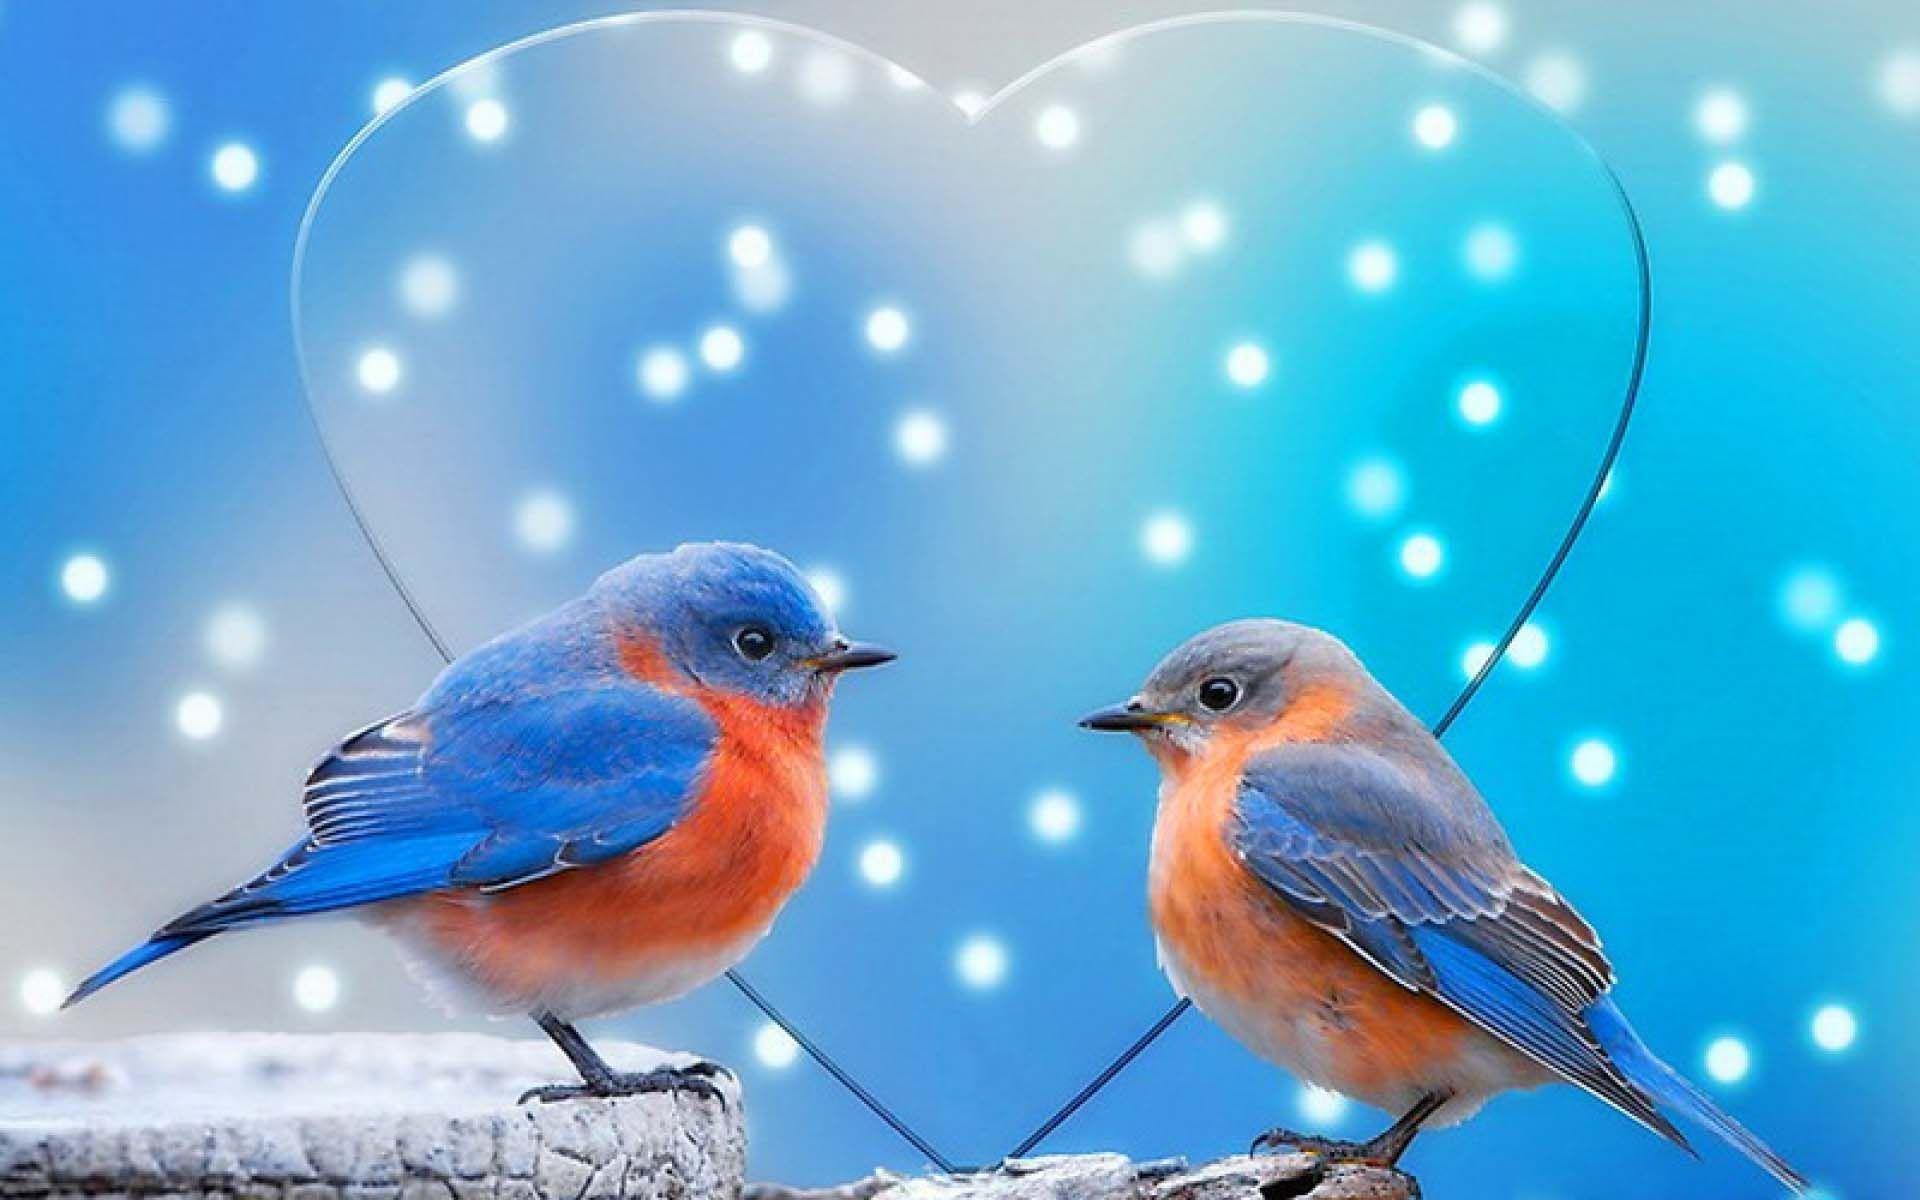 Sparrow Love Birds Image 051 Wallpaper - Love Birds Wallpapers For Mobile - HD Wallpaper